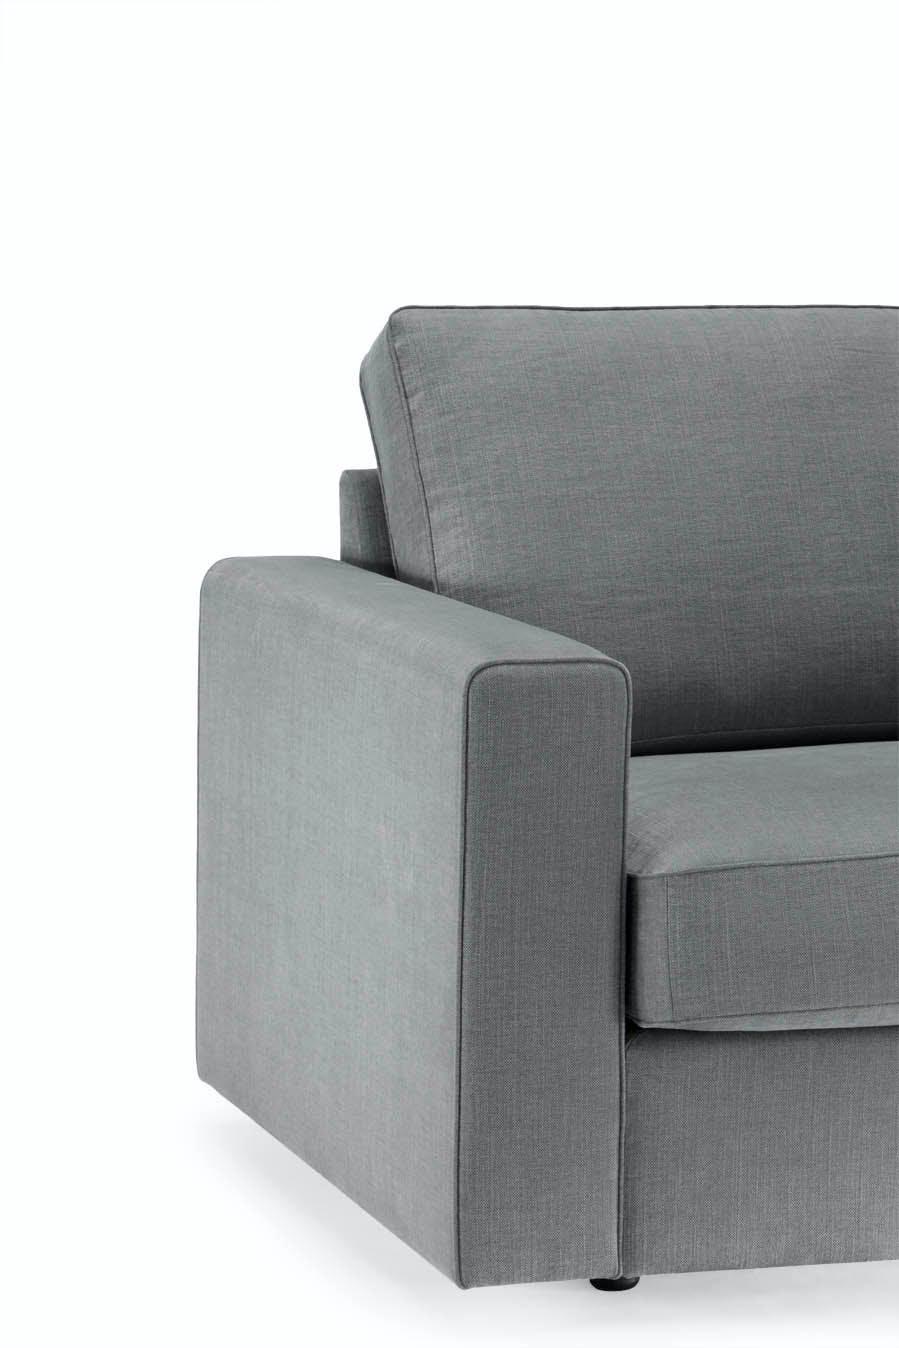 Jab Anstoetz High Back Jon Edwards Modular Sofa Haute Living